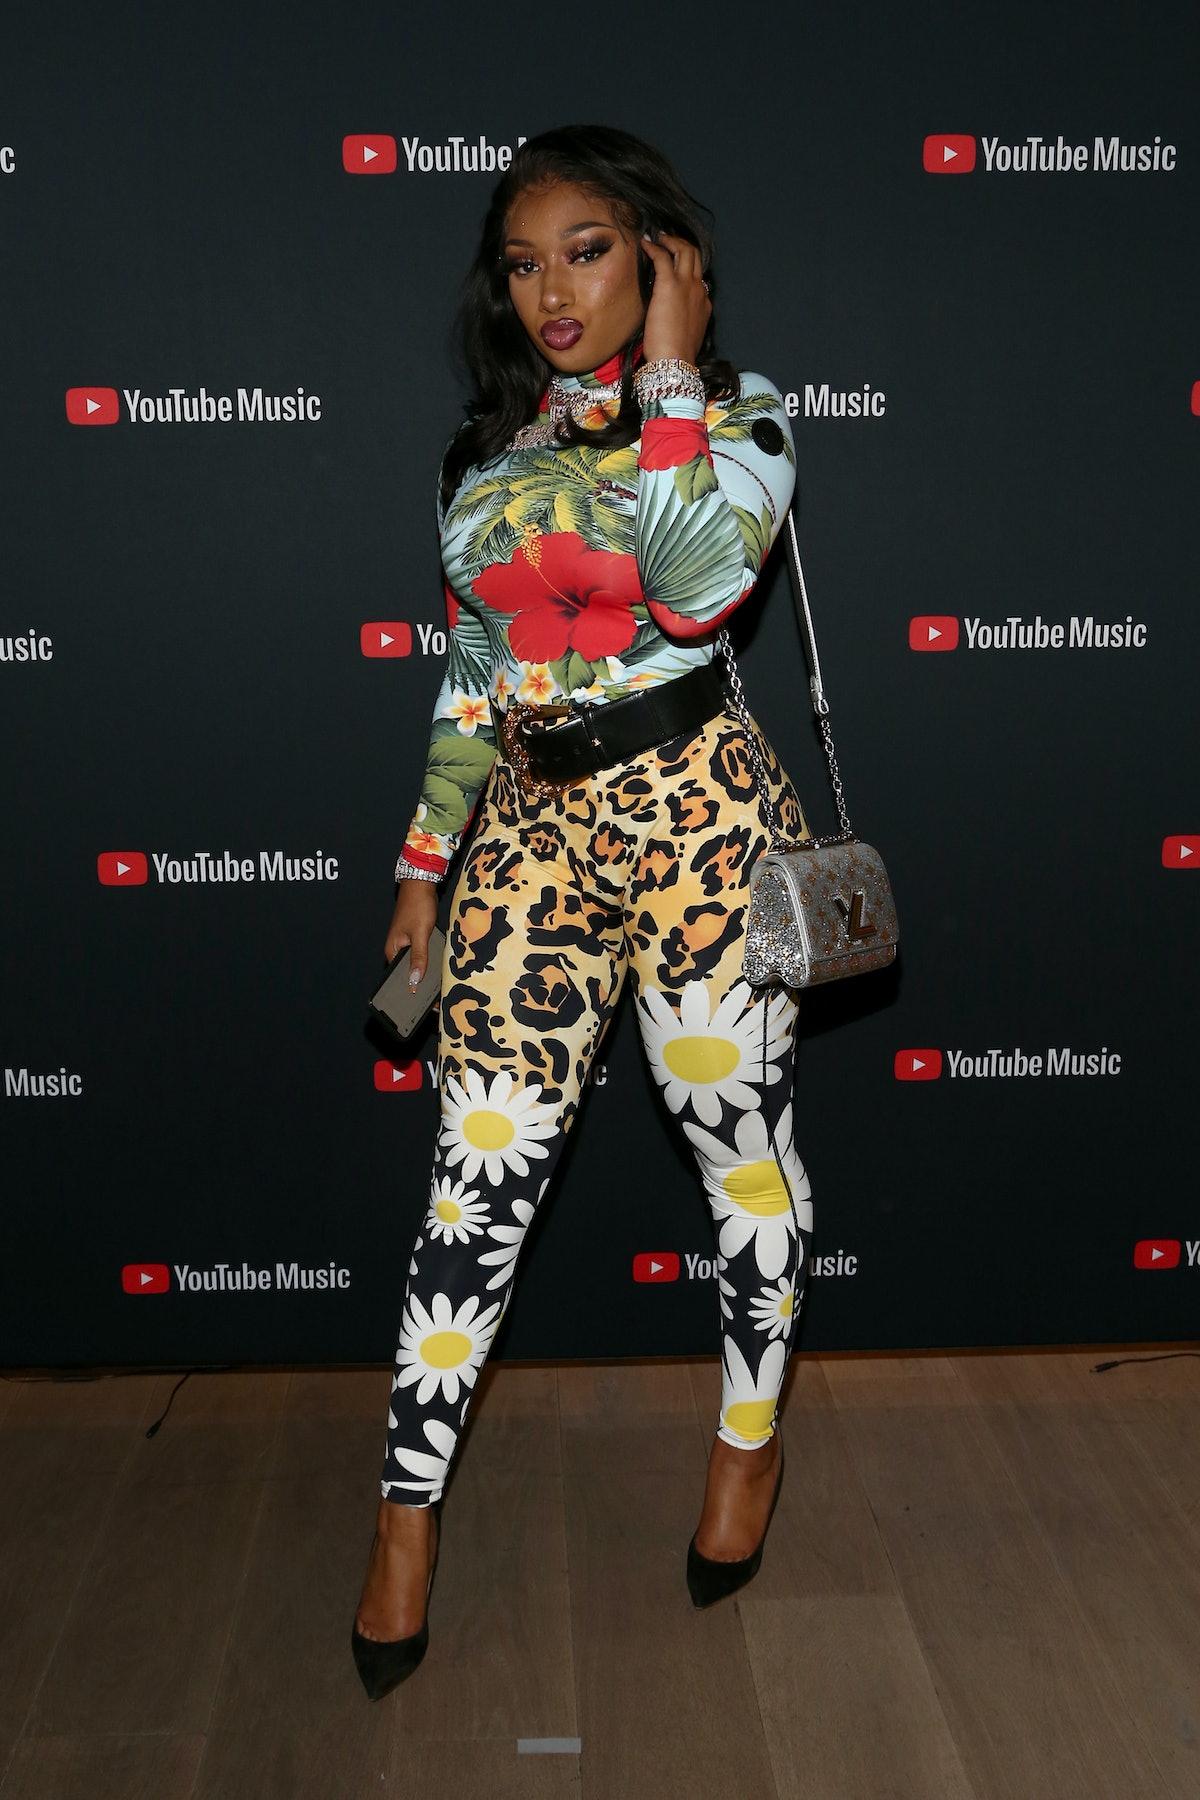 Megan wearing alot of floral patterns